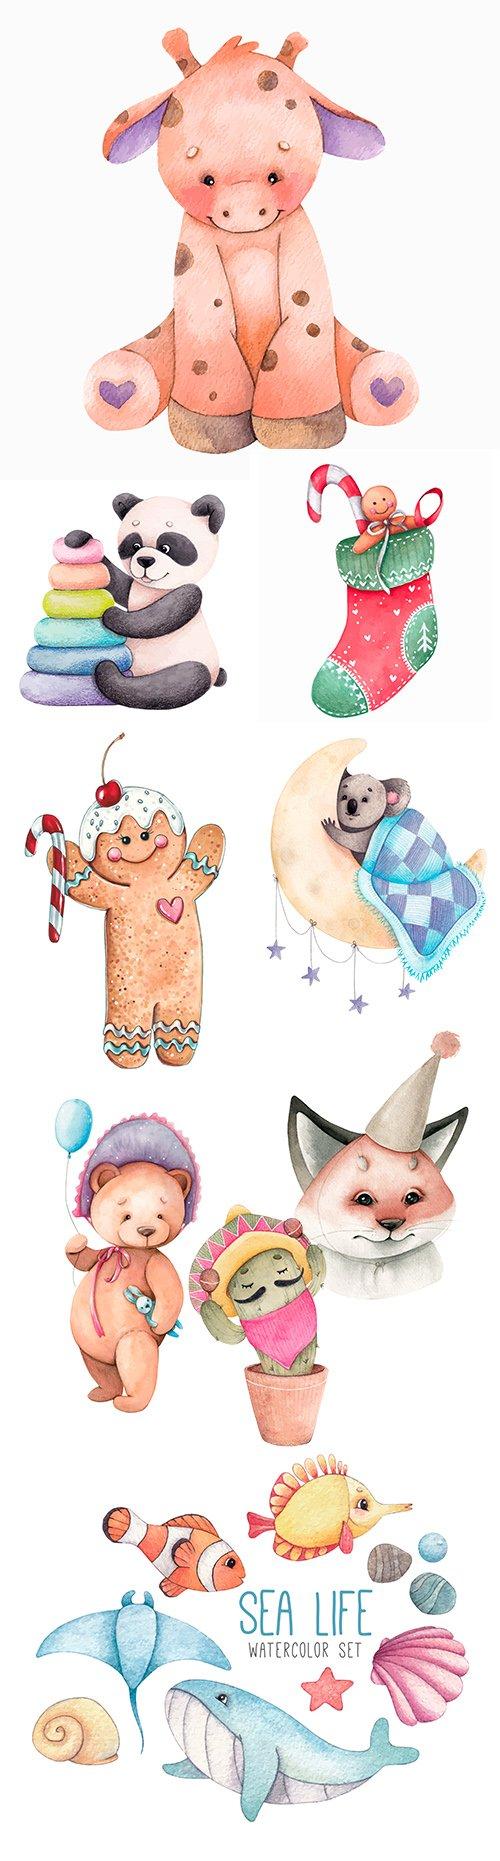 Watercolor illustrations cute cartoon animals in different caps